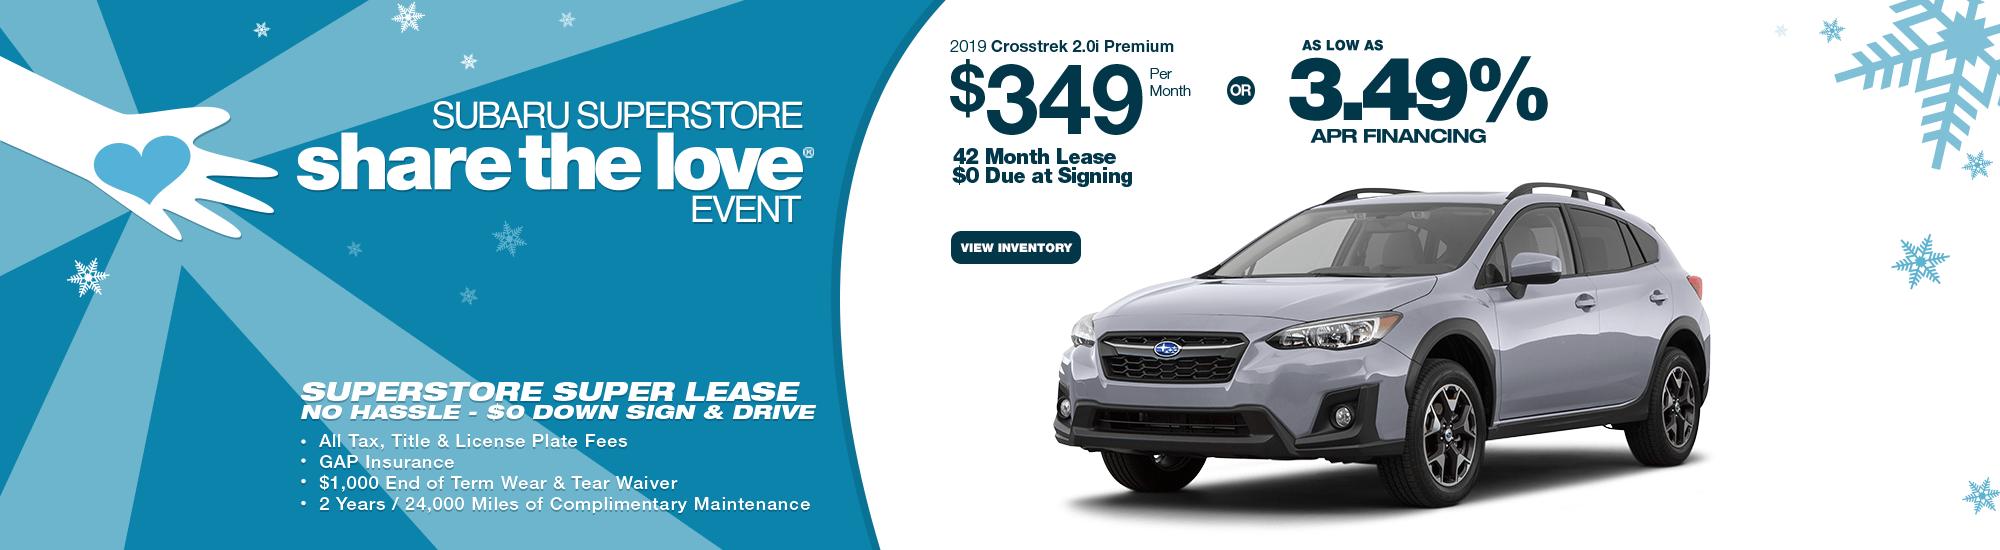 Finance or Lease or Finance a 2019 Subaru Crosstrek near Phoenix, AZ during Subaru Superstore's Golden Savings Sales Event